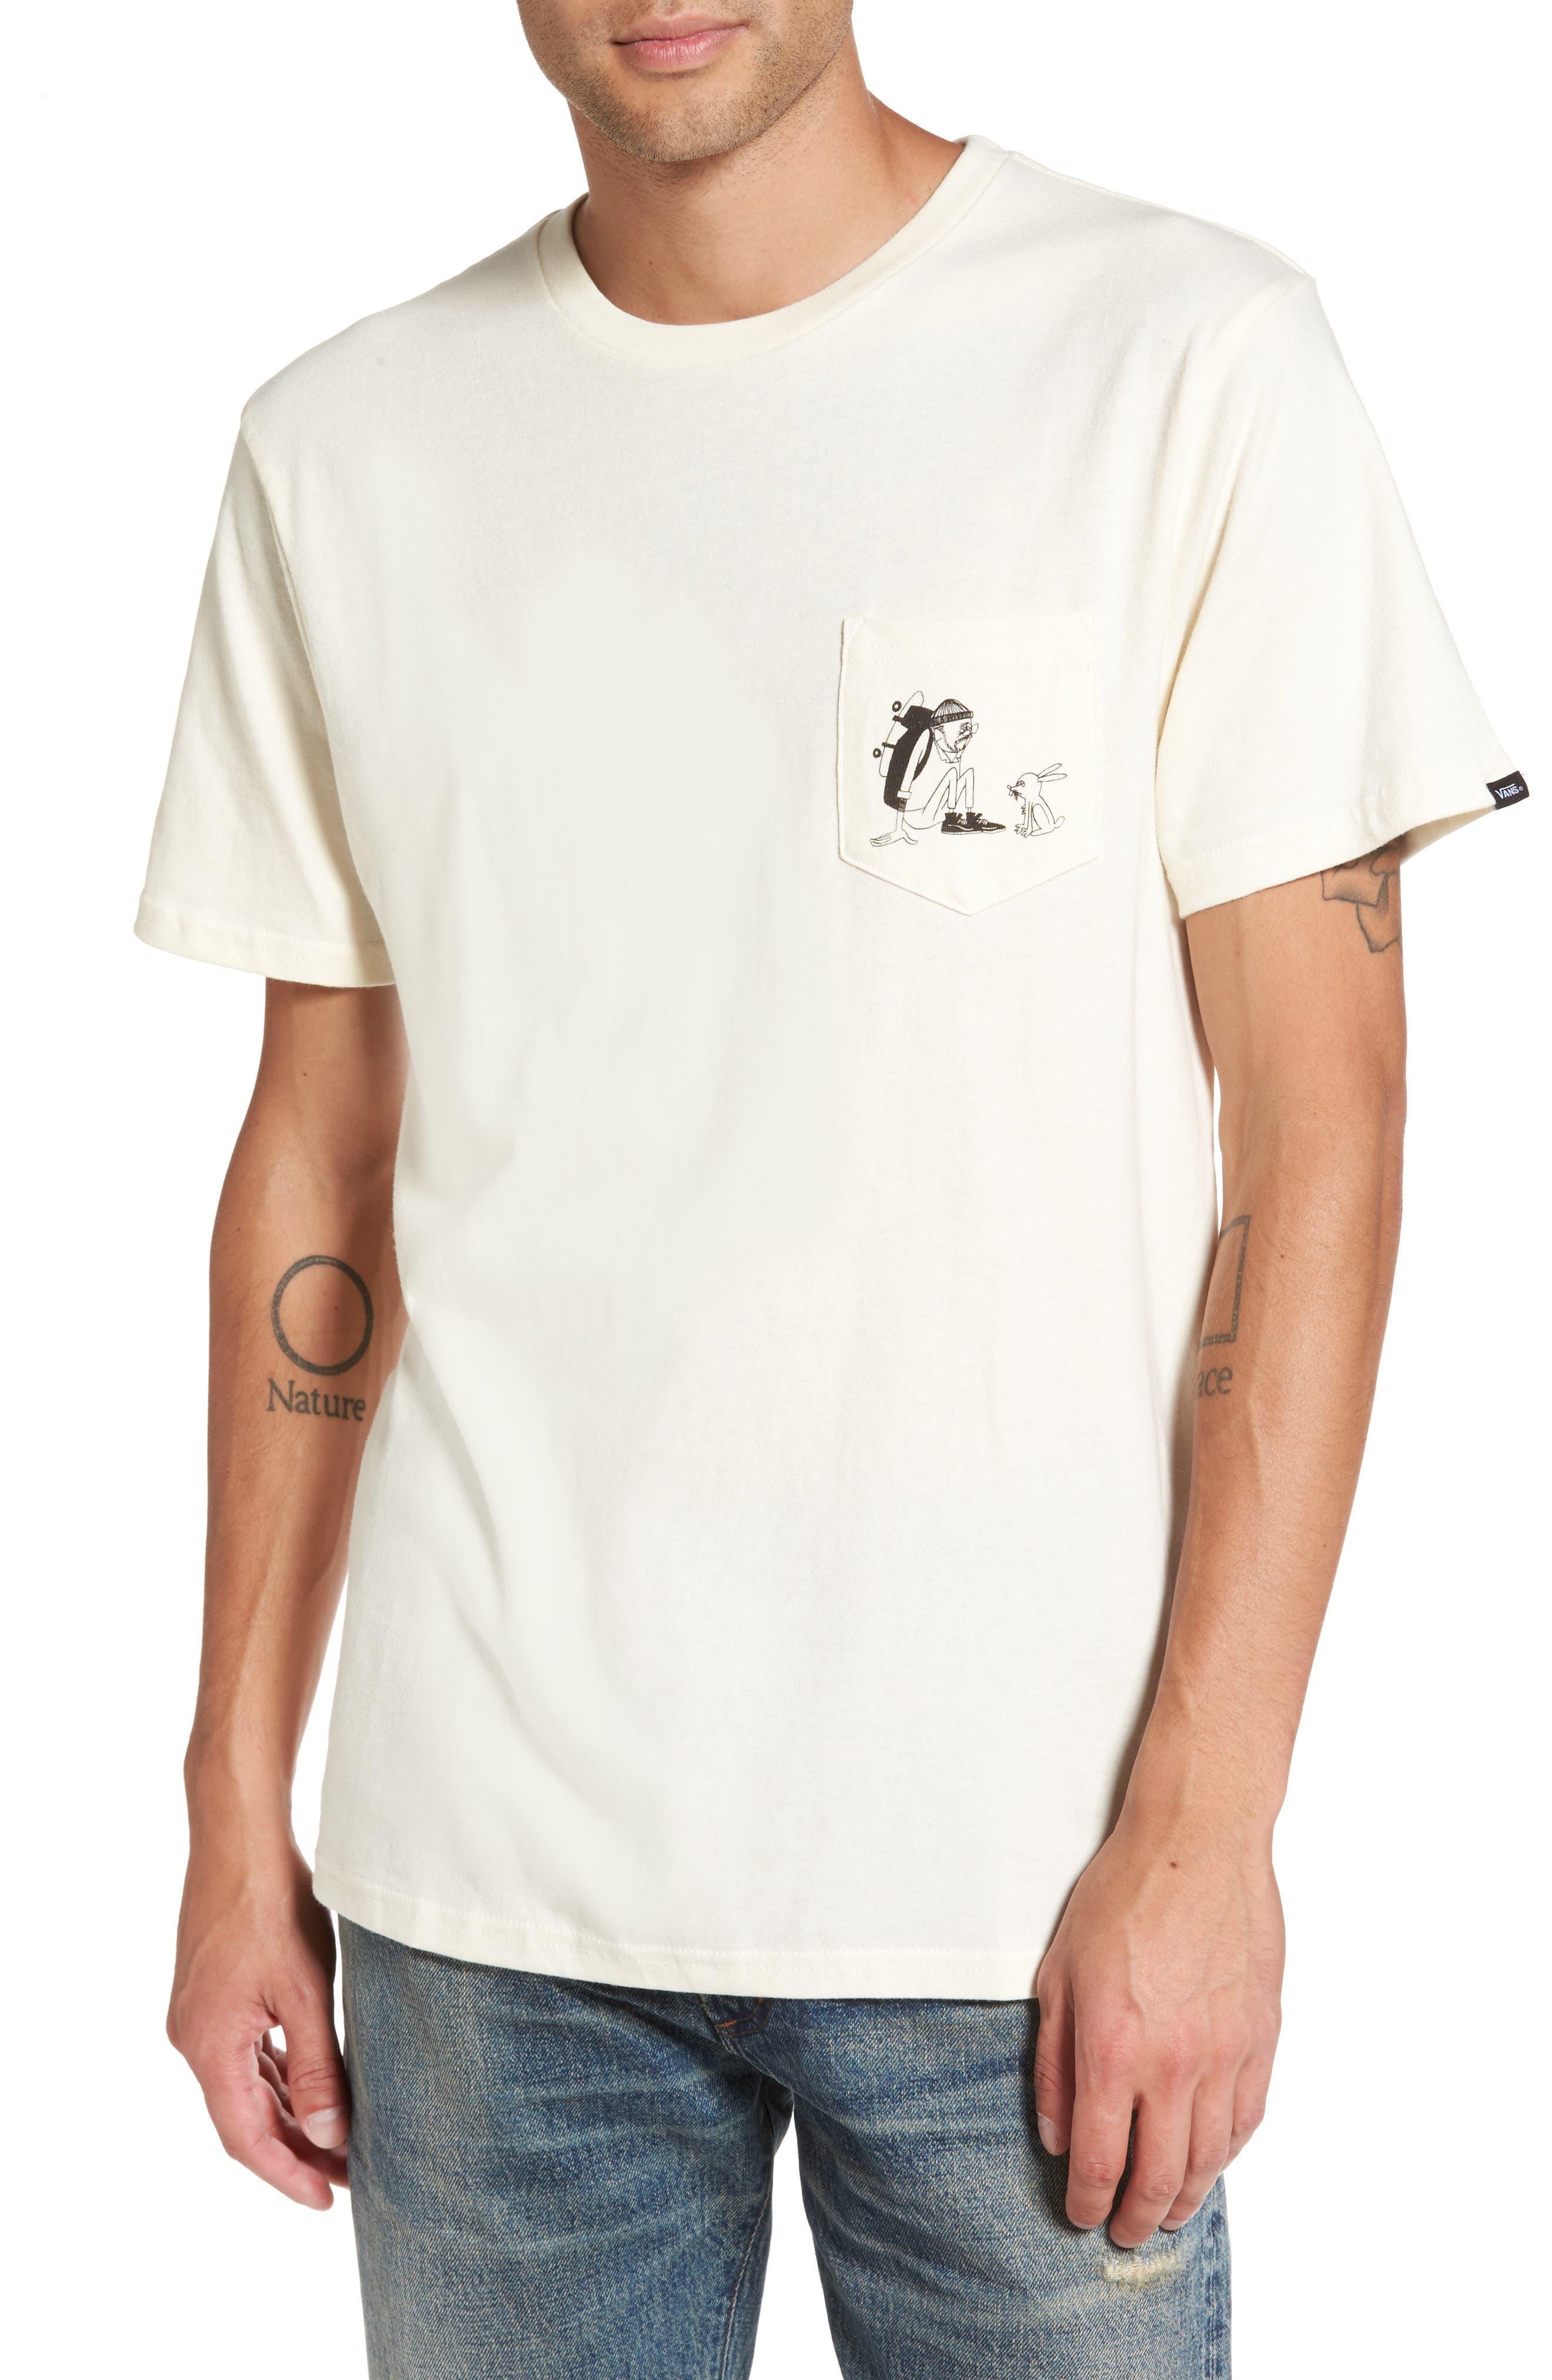 x Yusuke Hanai Outdoors Graphic Pocket T-Shirt,                         Main,                         color, Antique White